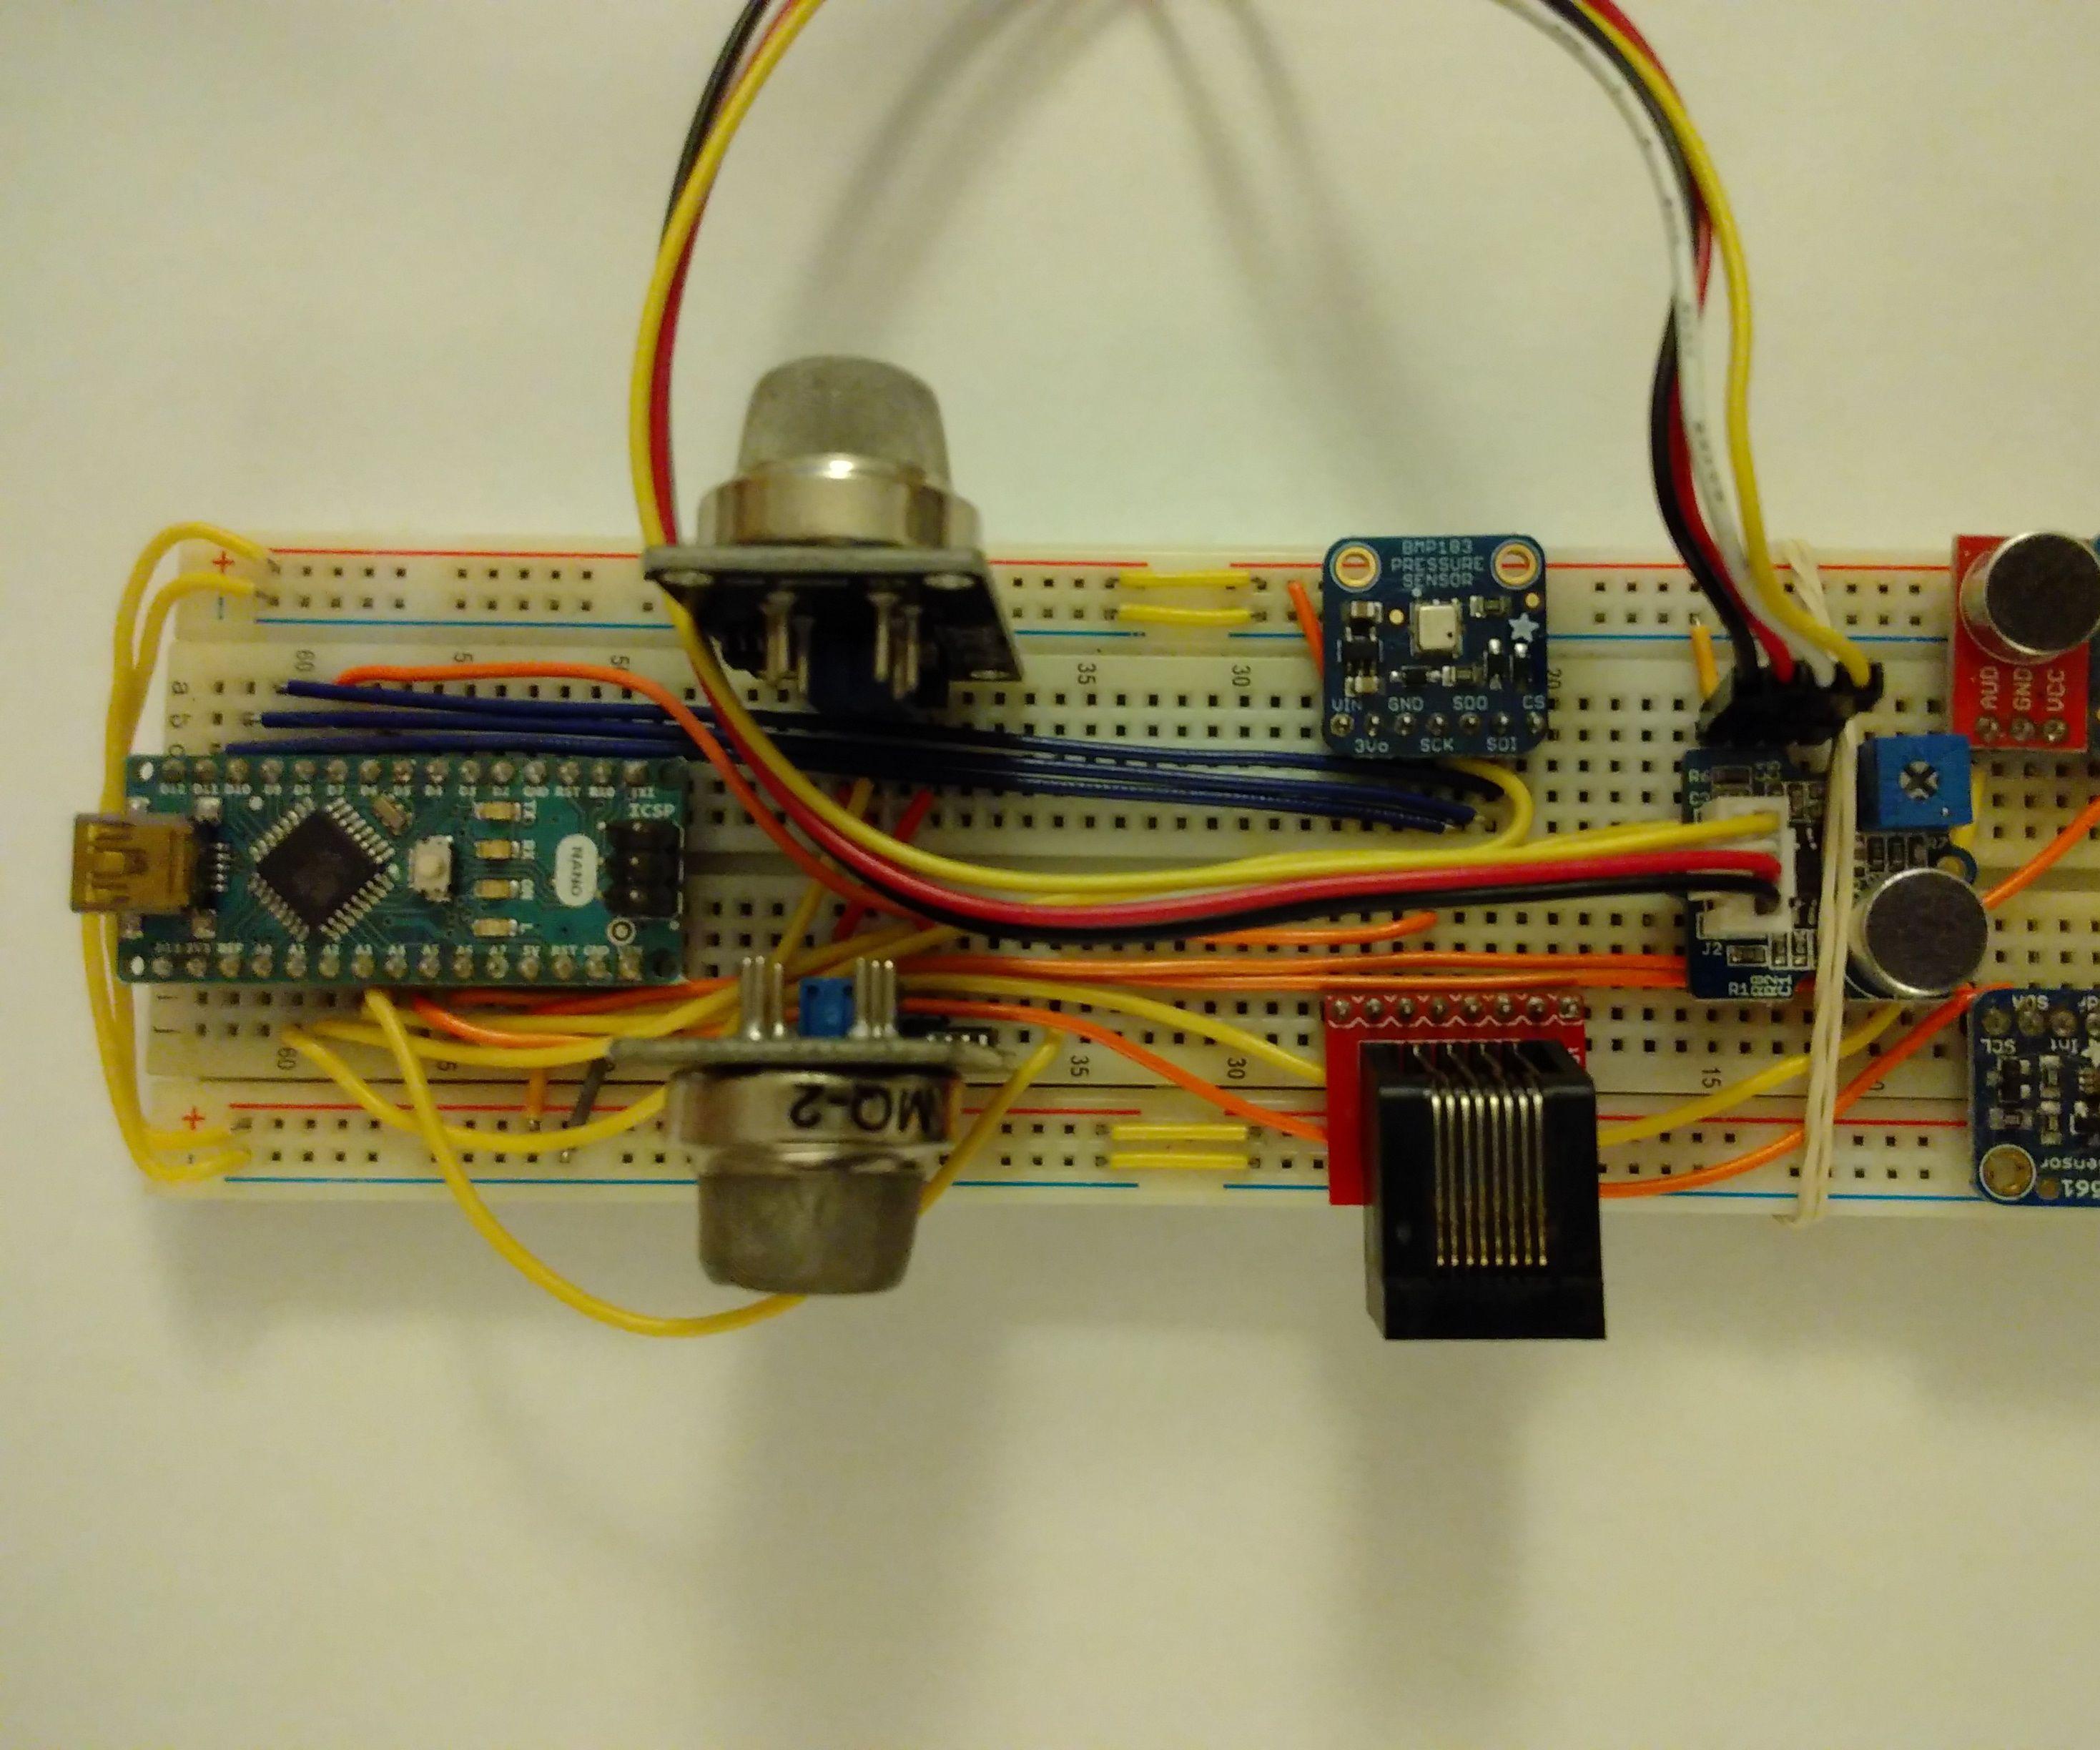 Arduino 1-wire Generic Client/Slave Device (Sensor)